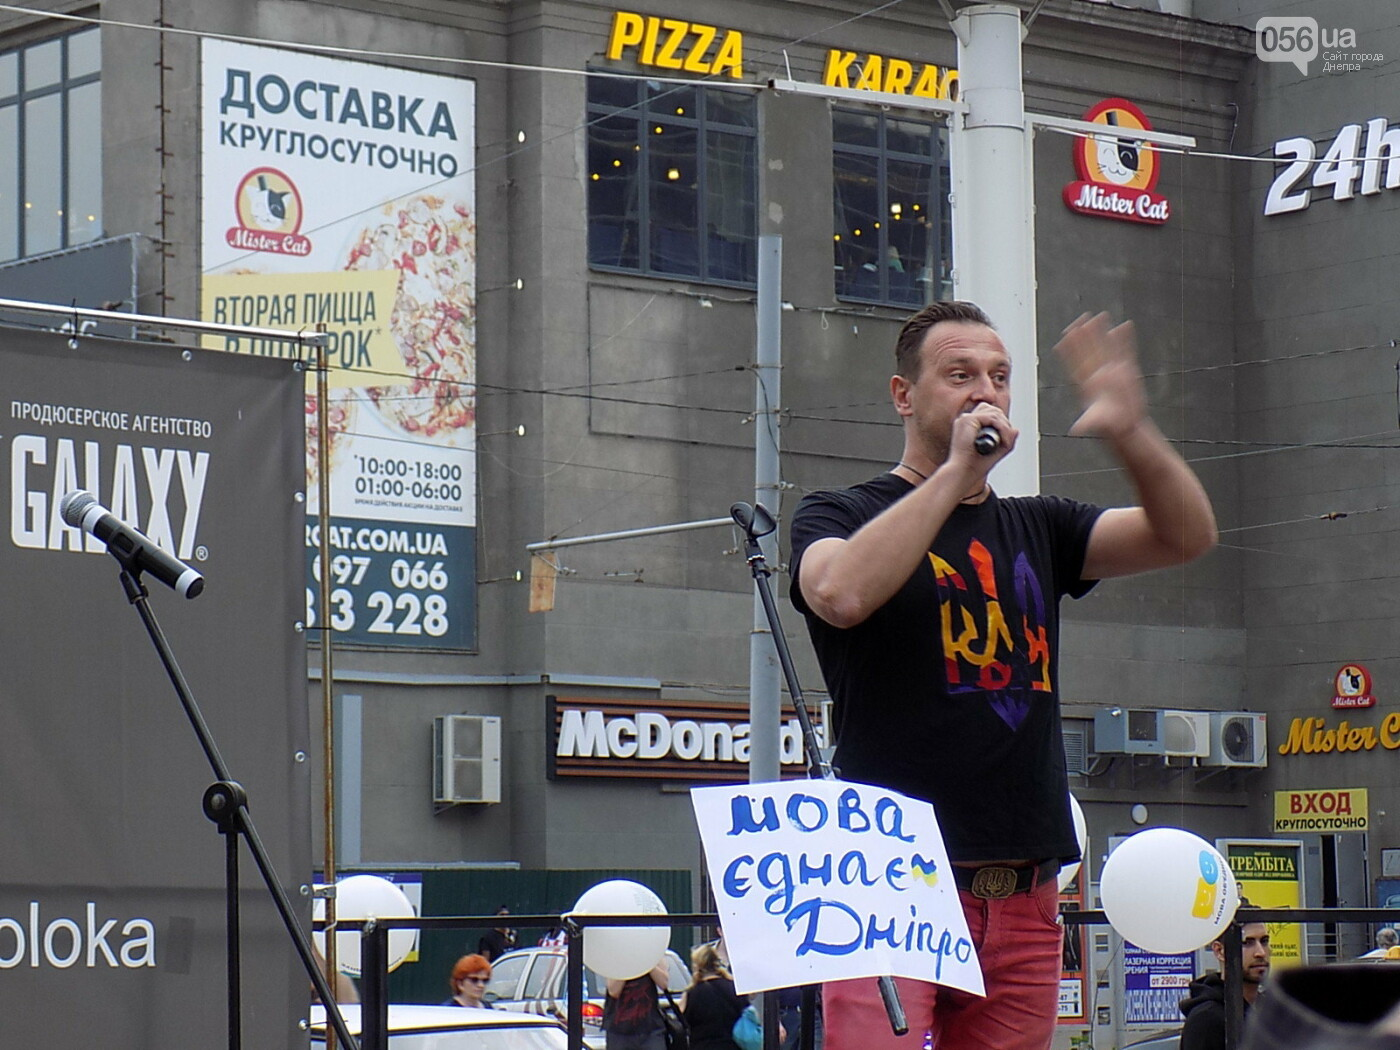 """Мова єднає Дніпро"": в центре города прошла символическая акция с концертом и подарками, - ФОТО, фото-18"